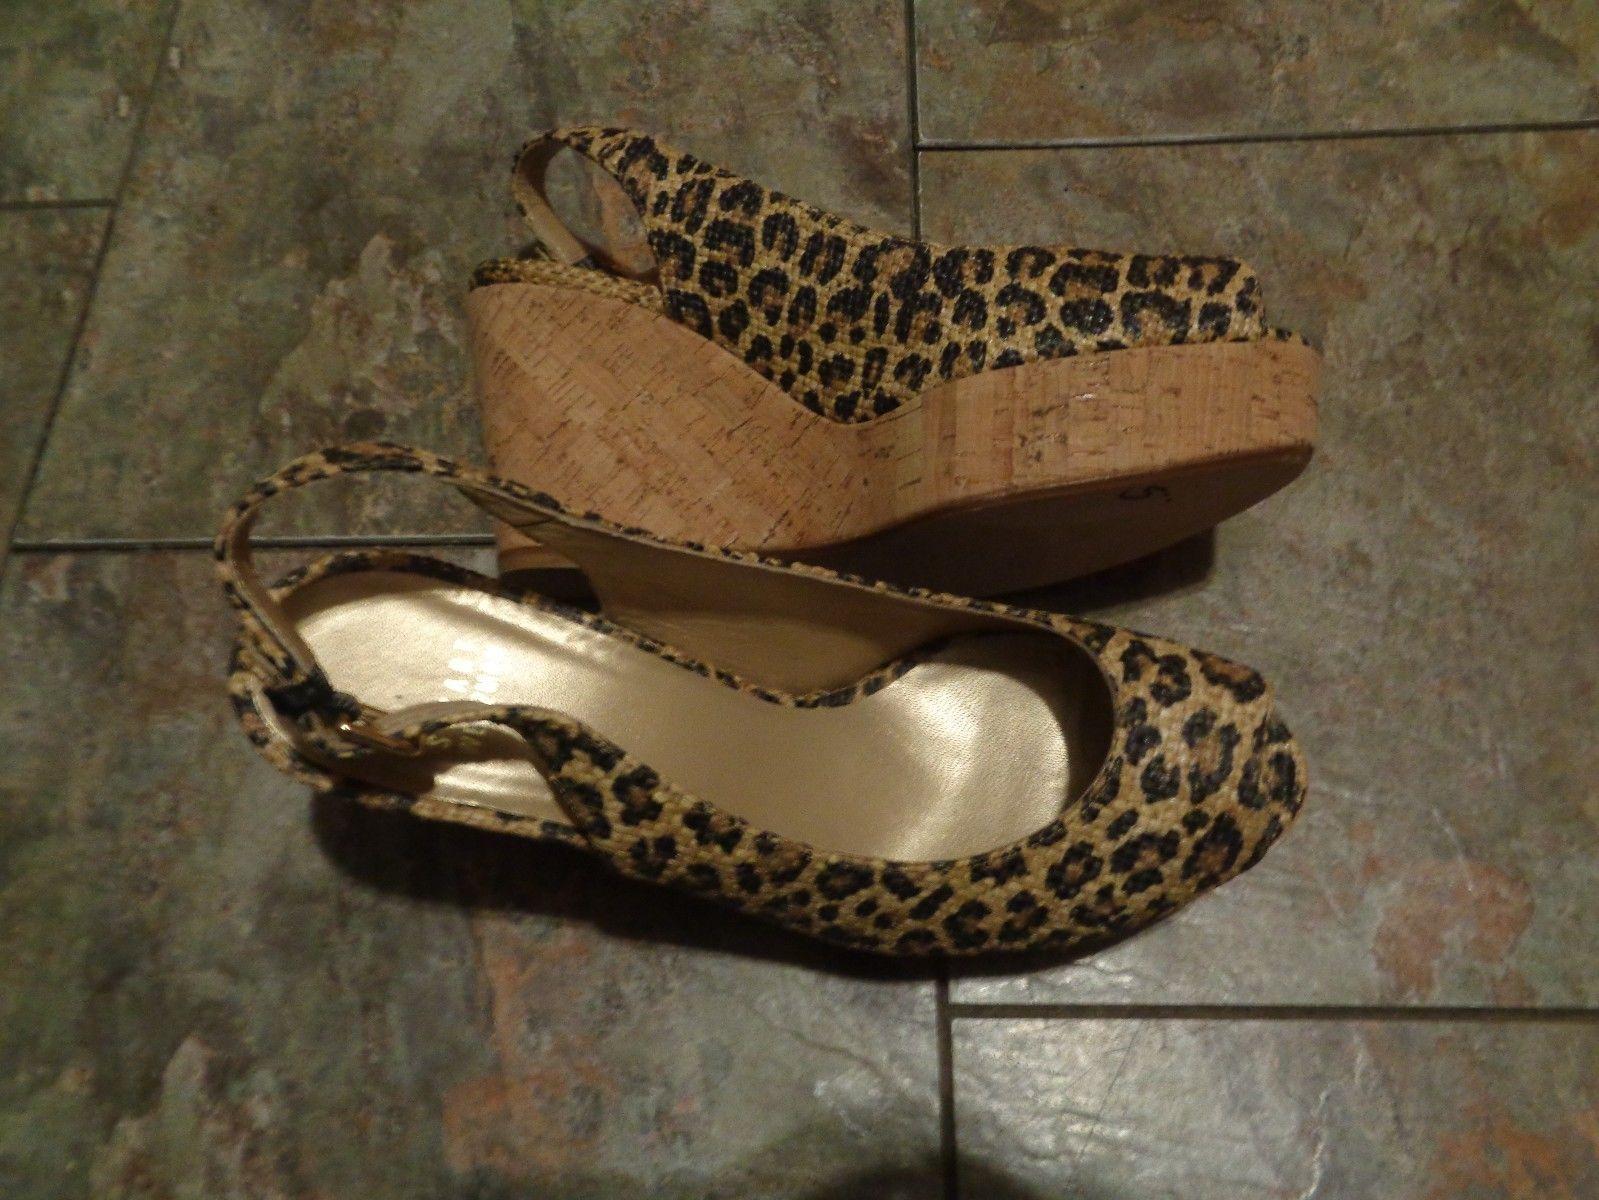 1a2a5f8808c 57. 57. stuart weitzman animal print slingback wedge heels size 9 ...